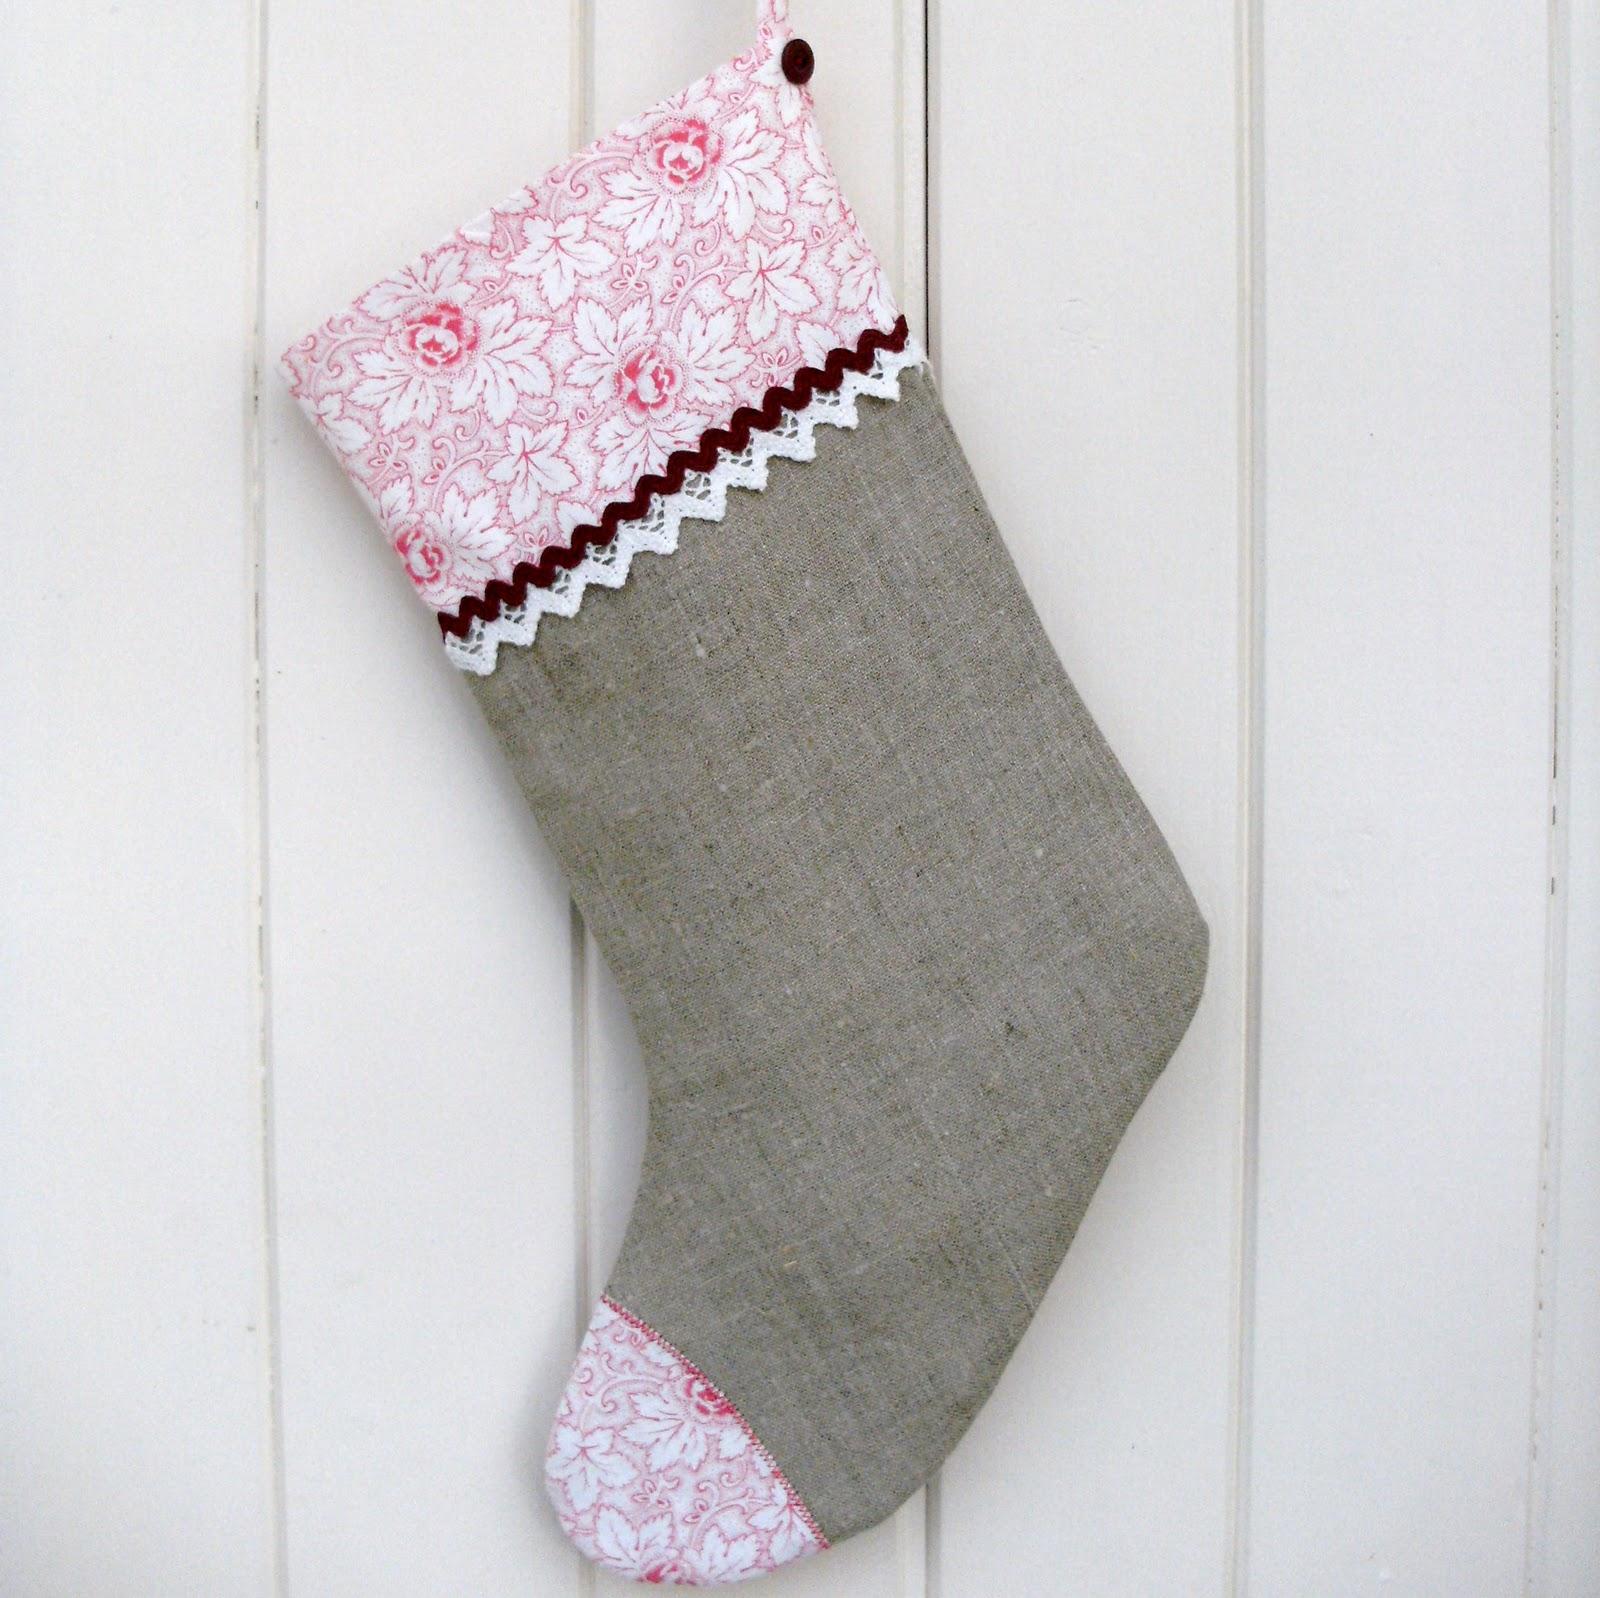 Sew Good By Deborah Good Make A Christmas Stocking